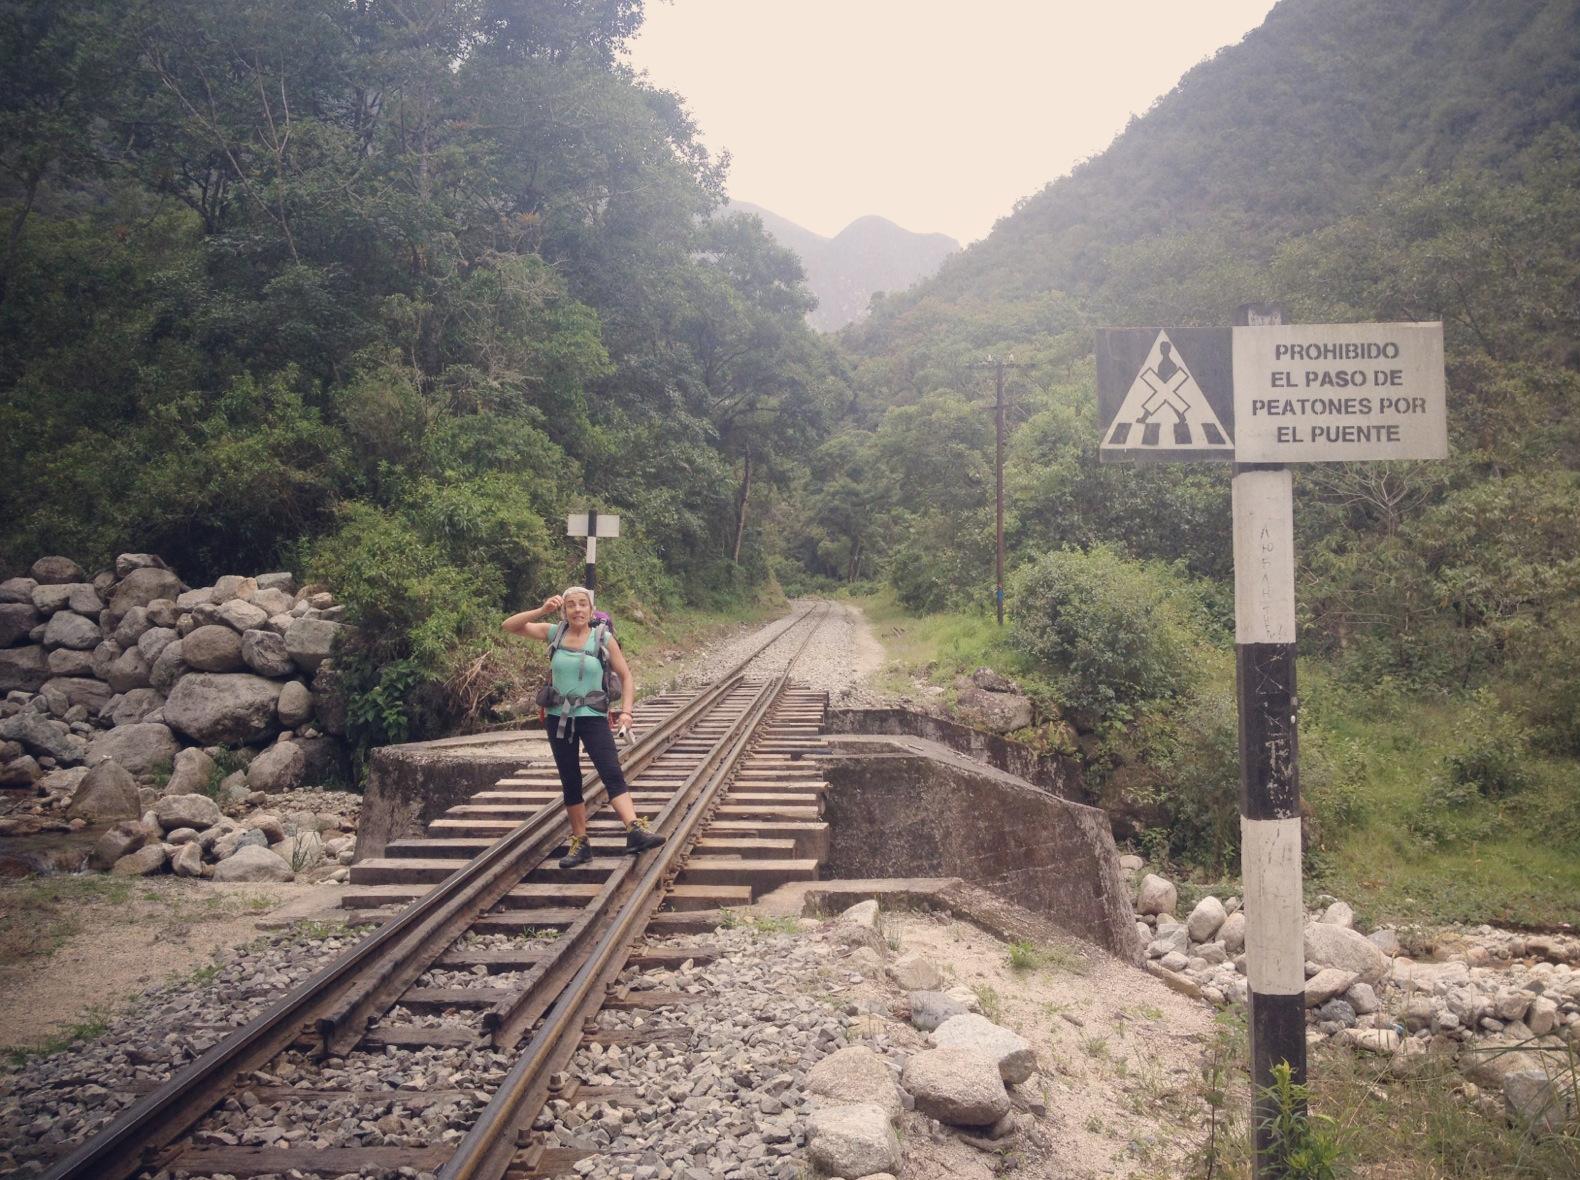 Peru 2013_Camino barto a Machu Pichu. Sonsoles Lozano.